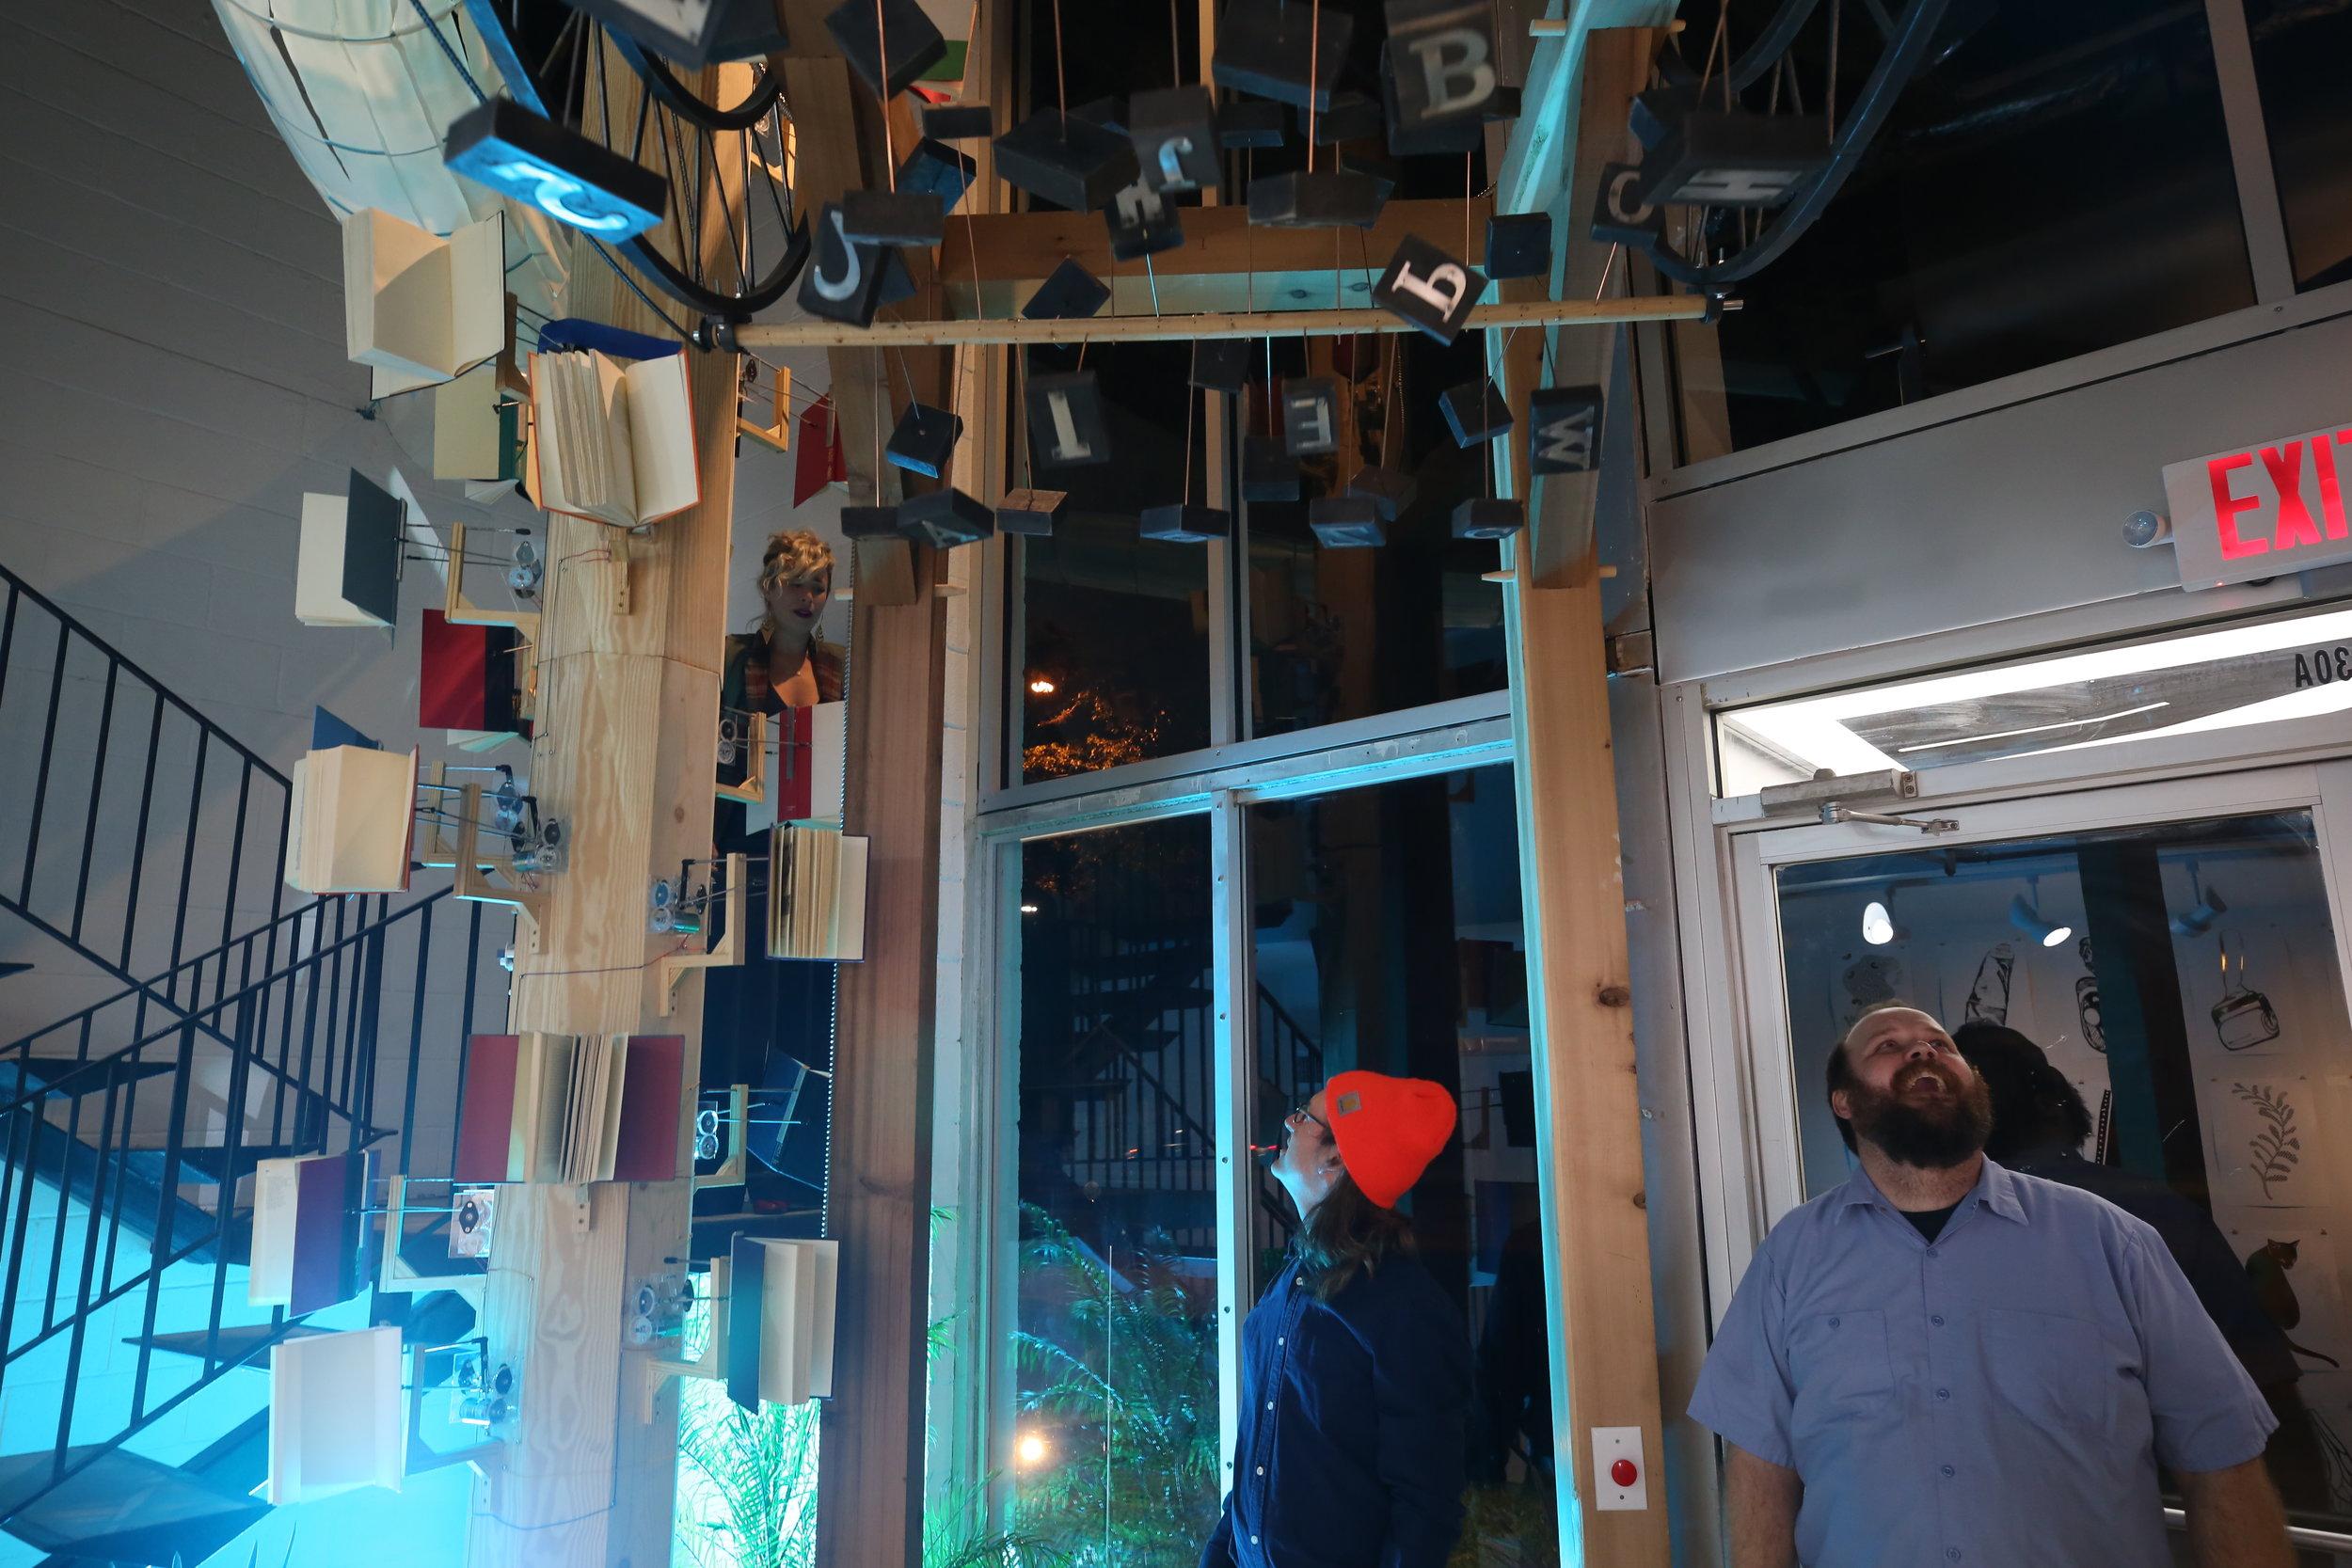 11-28-2017 Opening of Paper Machine 186.jpeg